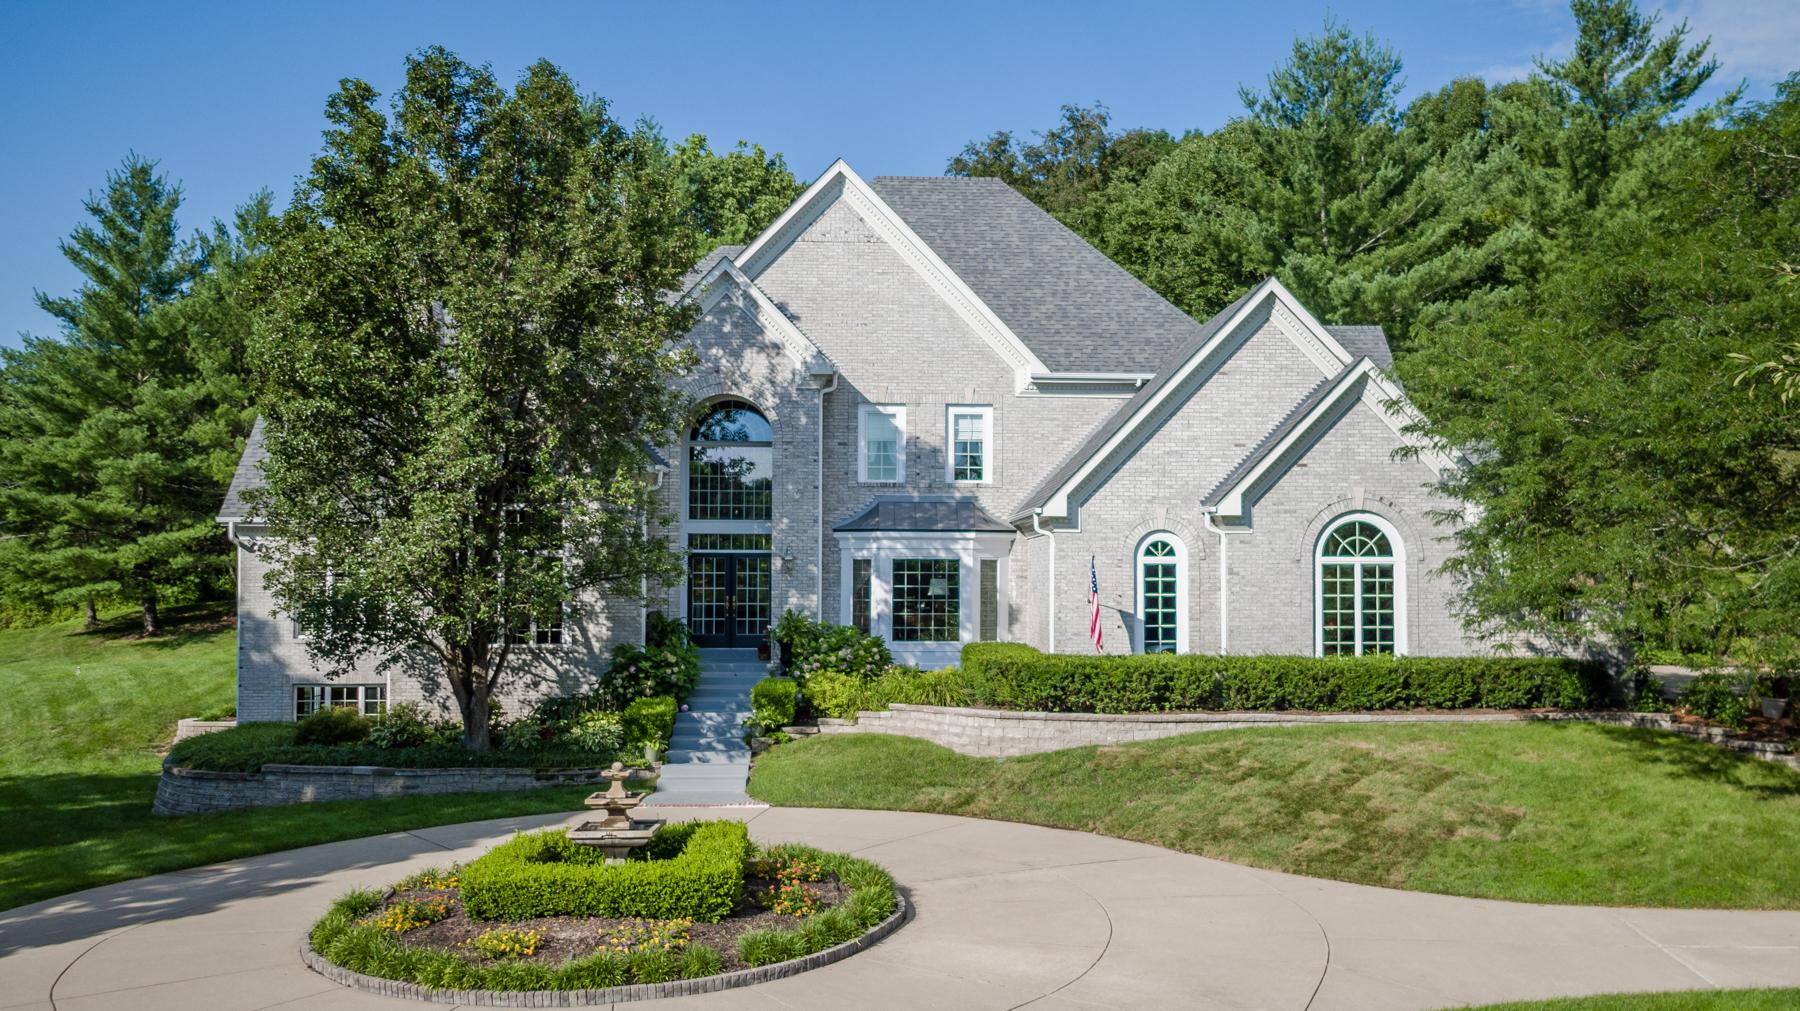 独户住宅 为 销售 在 Deer Pointe Estates 19300 Deer Pointe Estates Drive Wildwood, 密苏里州, 63038 美国